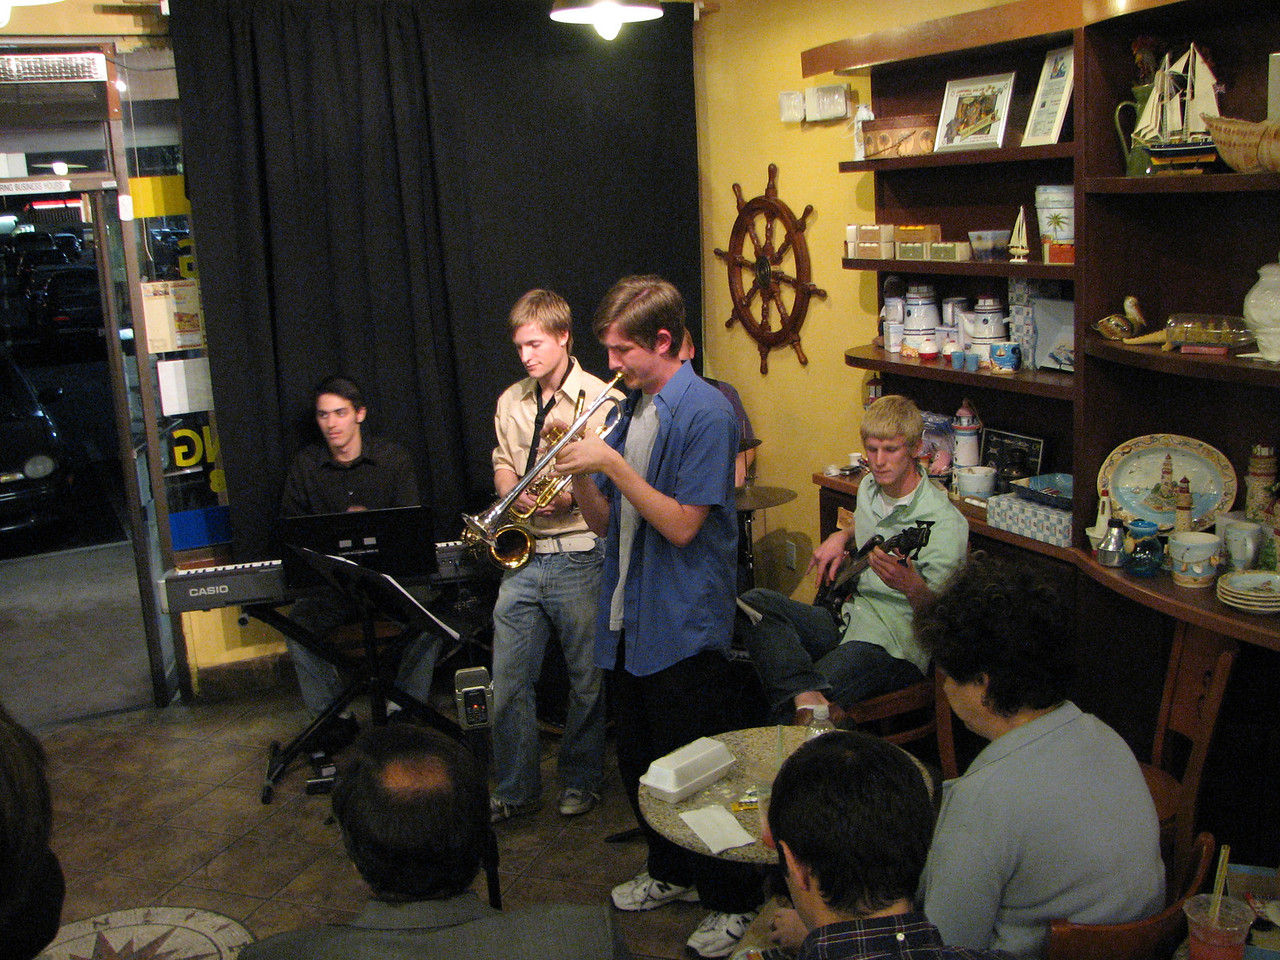 2008 03 19 Wed - Trevor Gomes et al  jazz combo @ The Big Straw 2